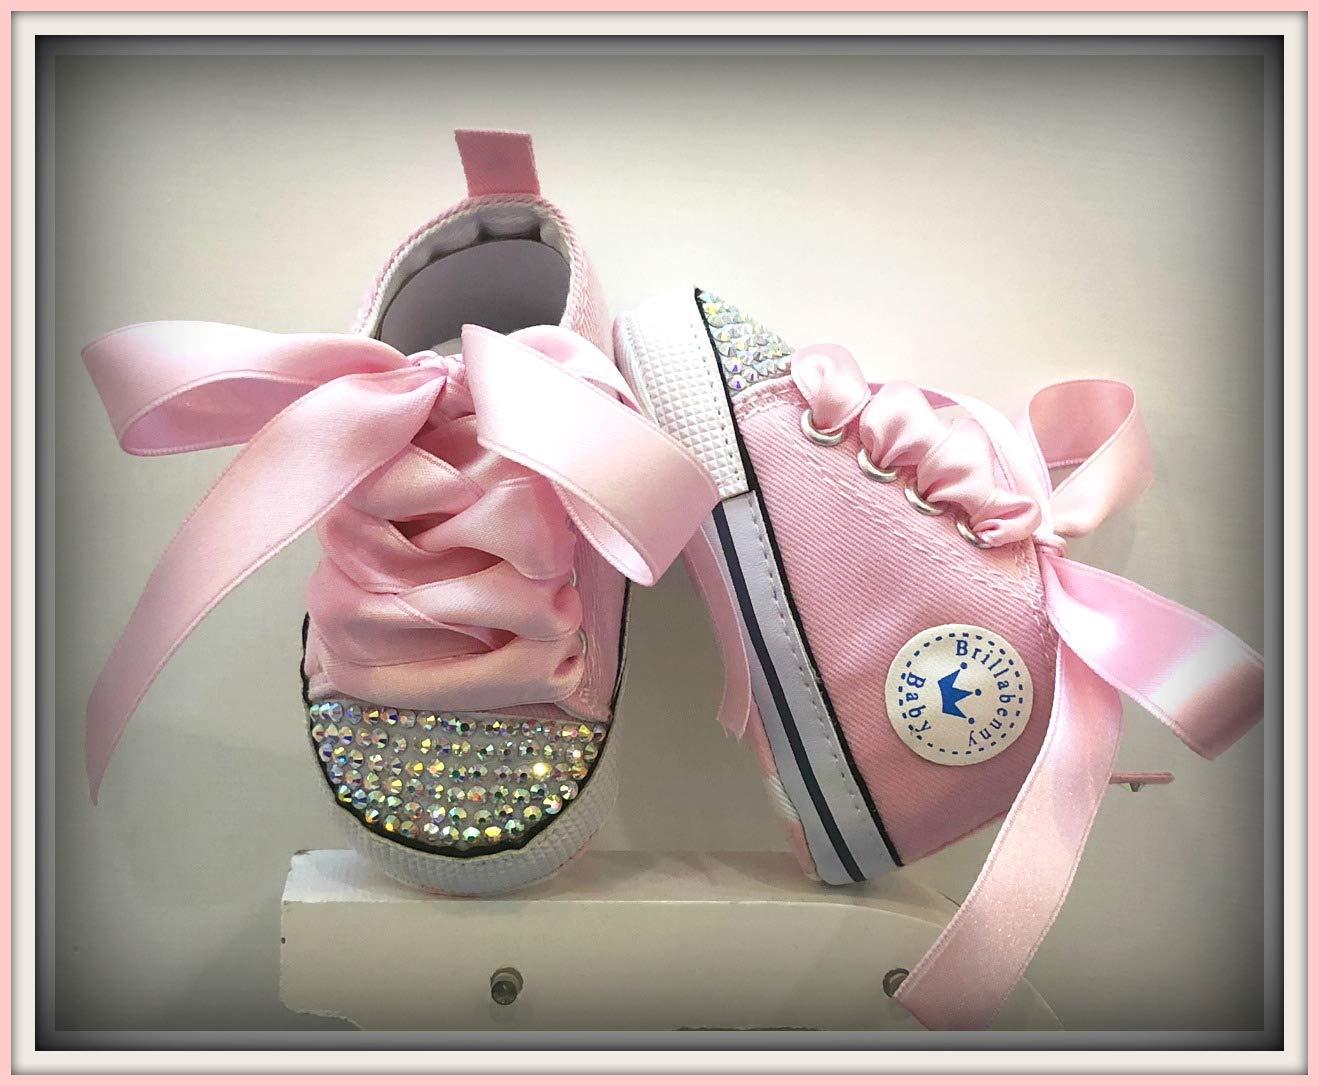 7c9859c9bd BrillaBenny Scarpine Scarpe Sneakers Strass Bimba Neonato Bambina Rosa/Baby  Shoes Pink Birthday Party Events Princess Rhinestone Crystal Diamond Bling  ...